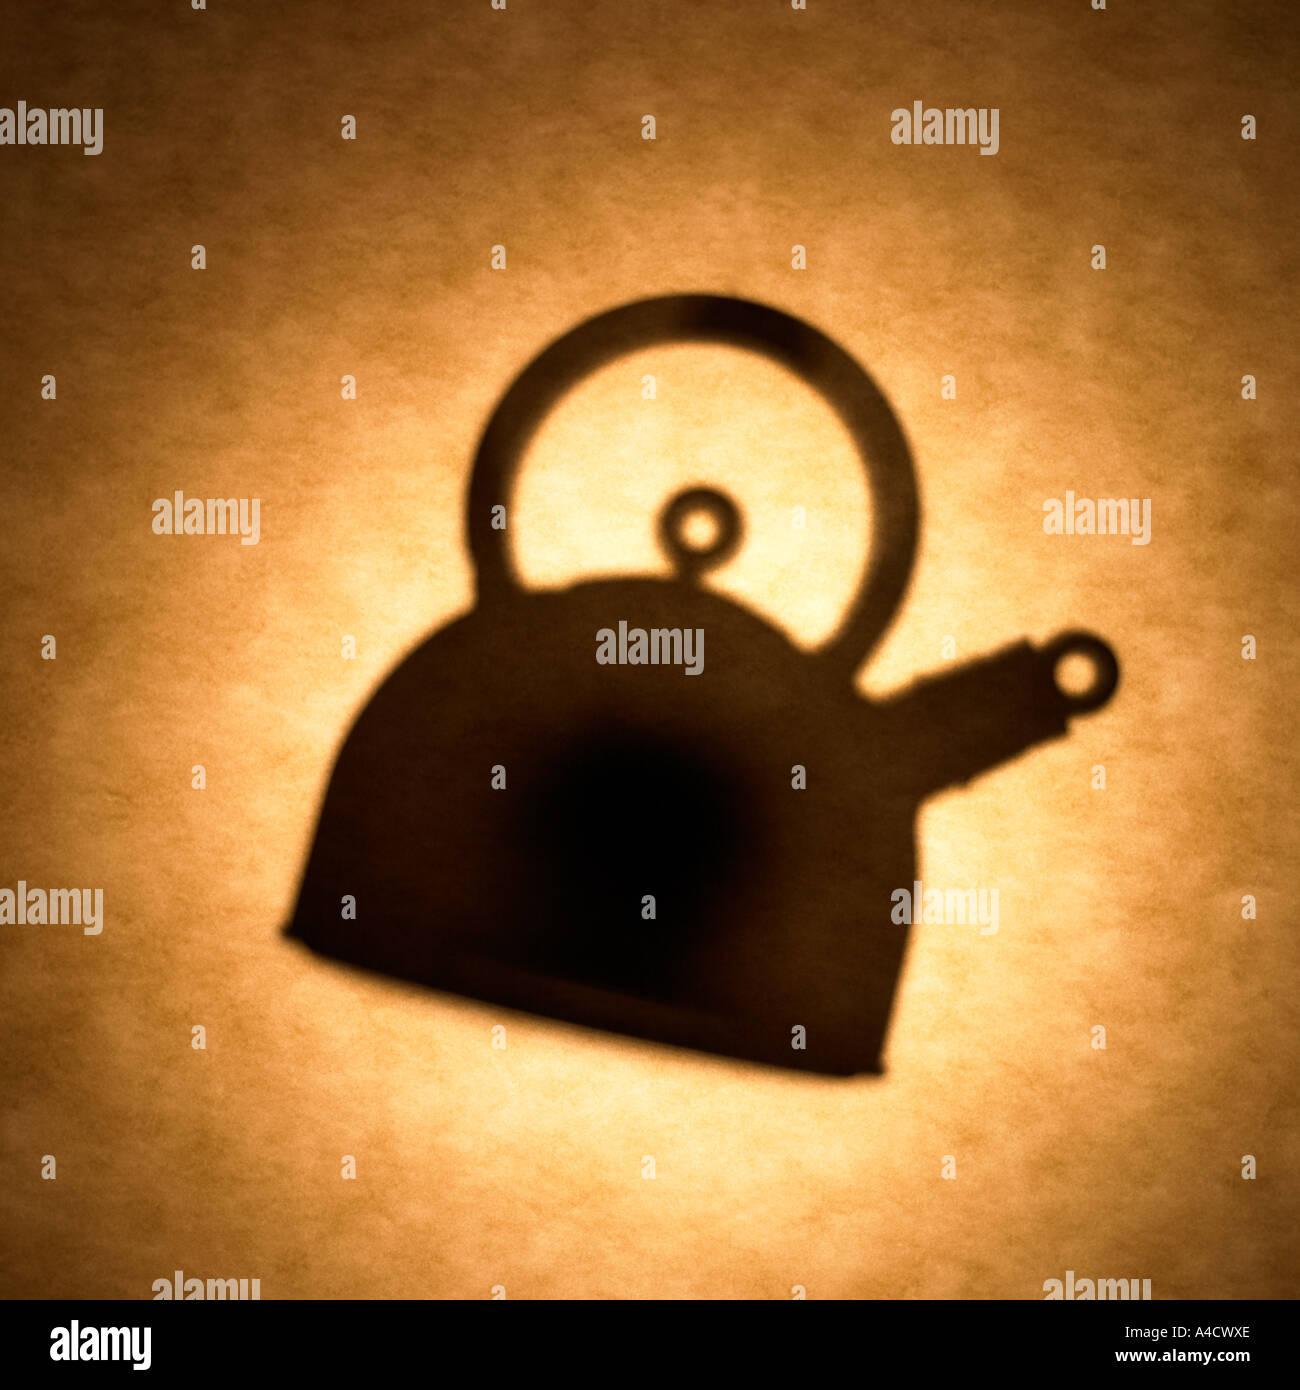 Tea kettle silhouette - Stock Image